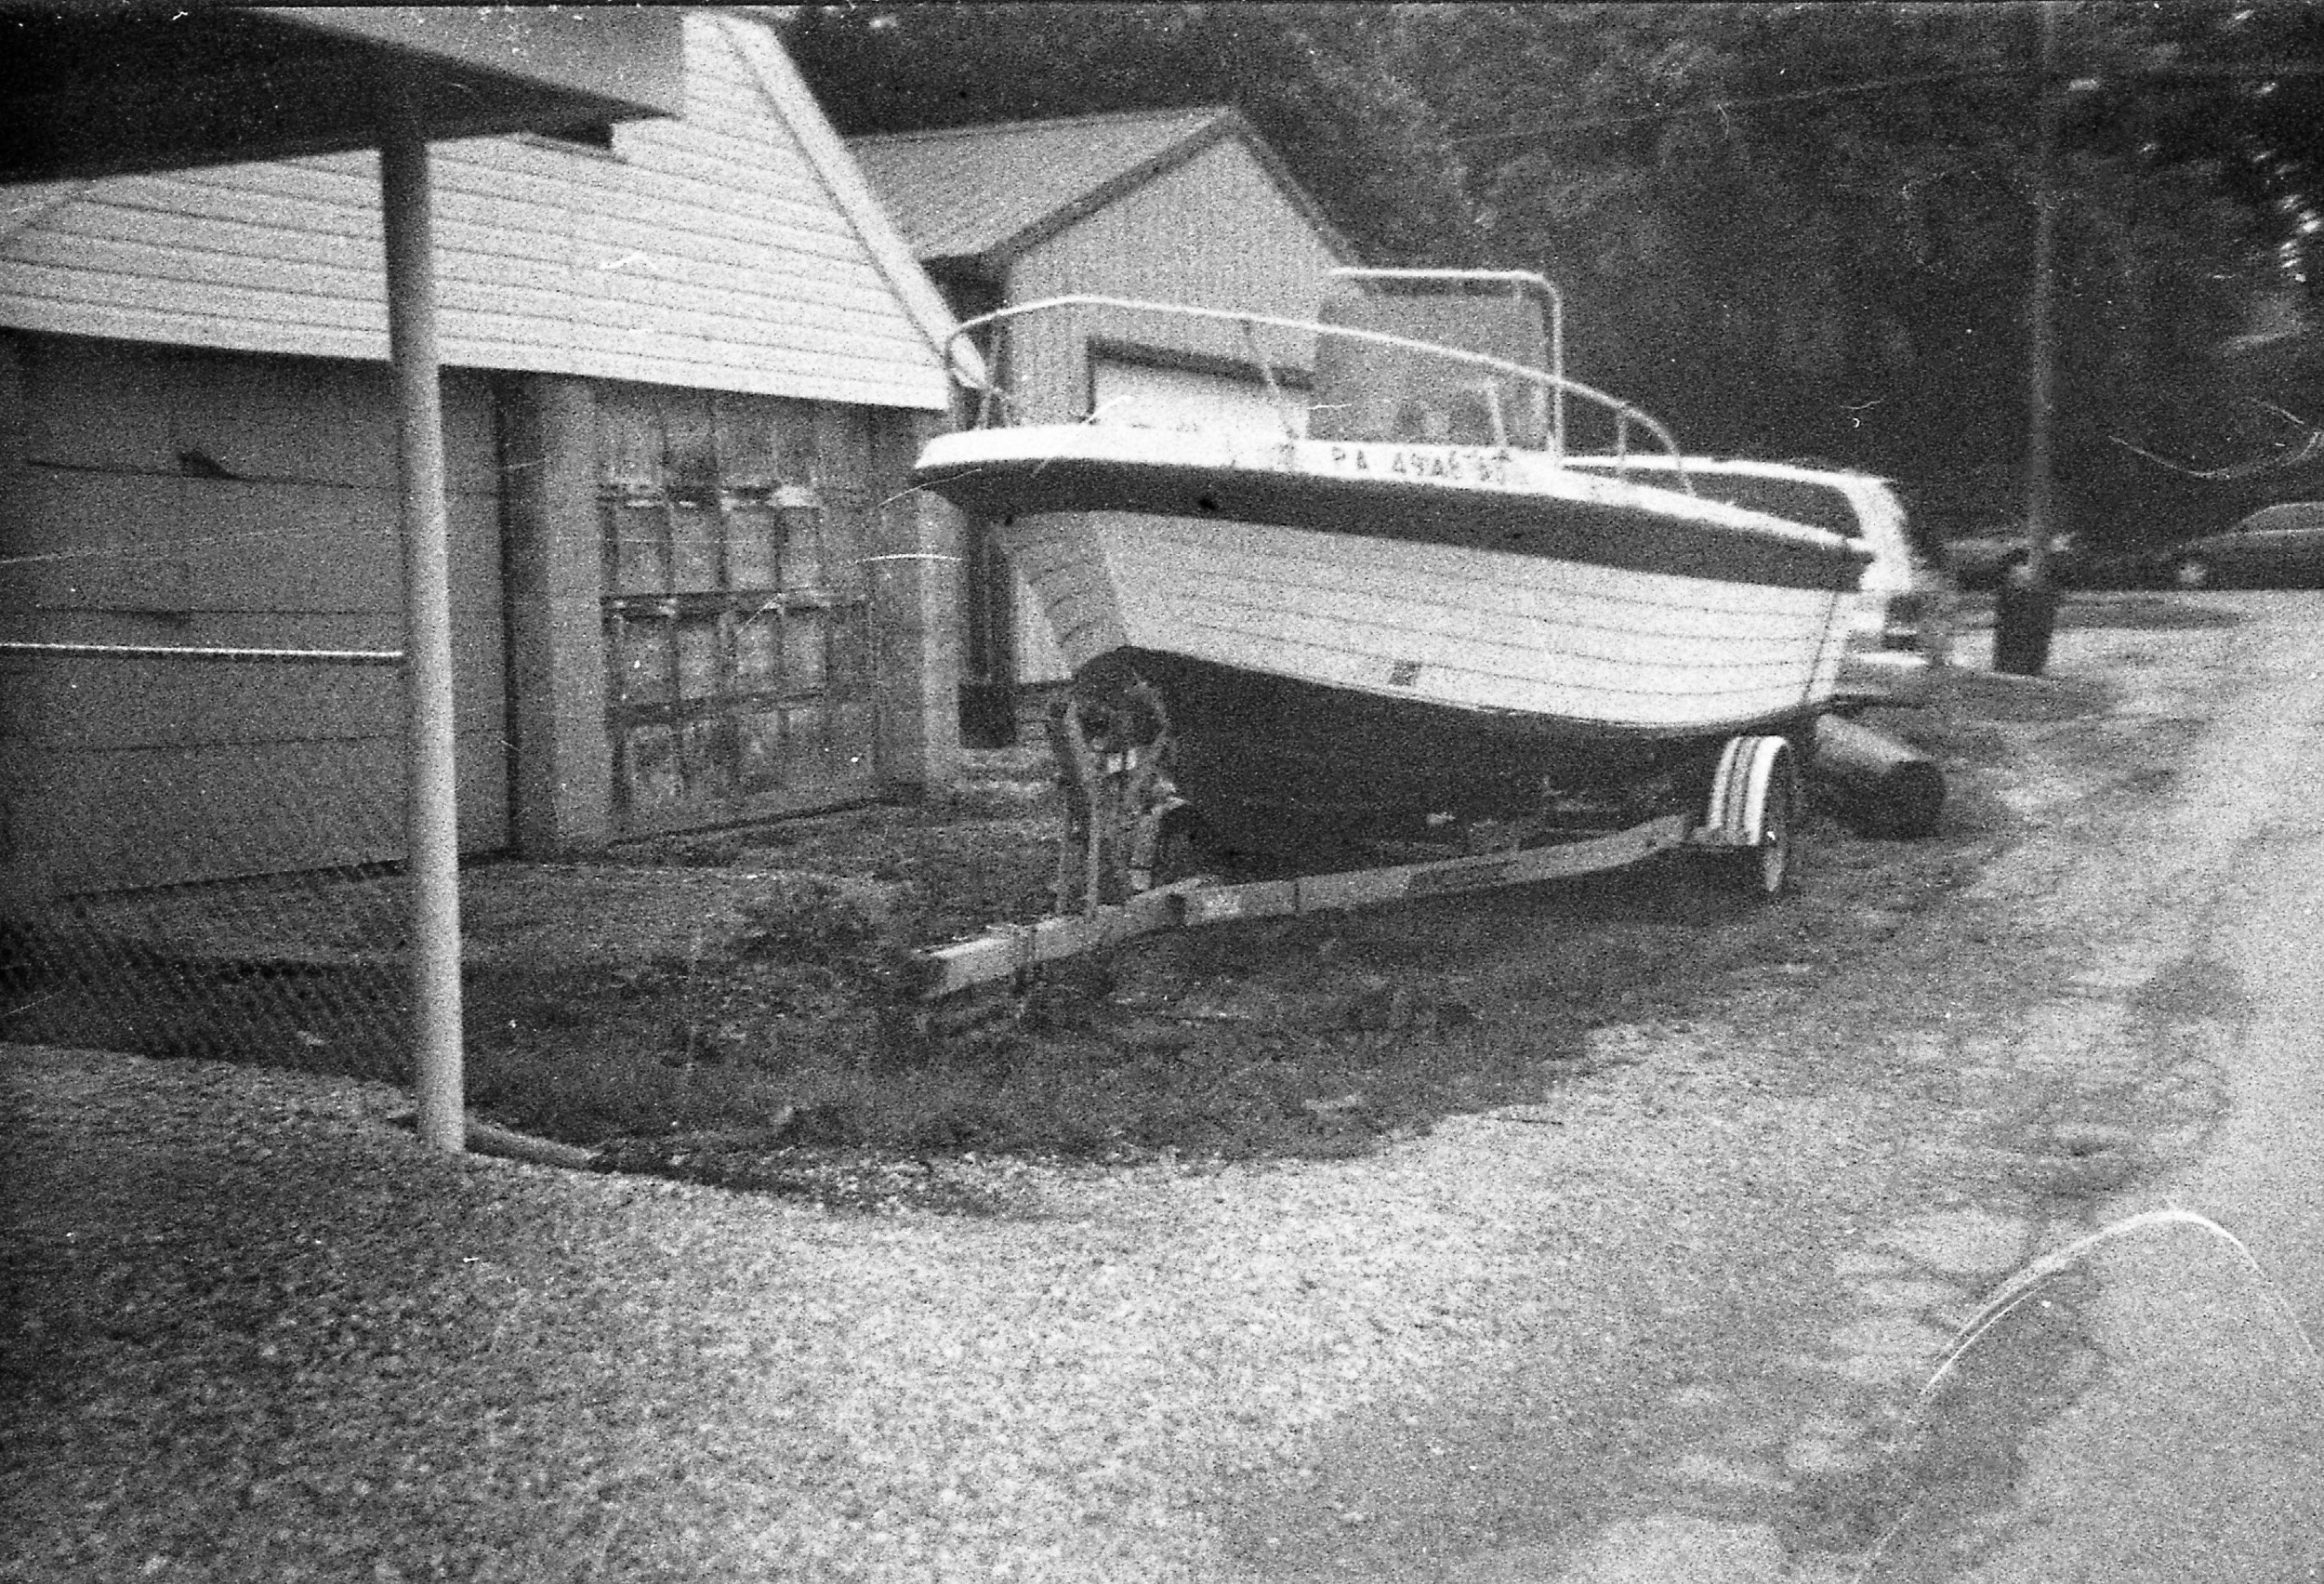 alley_boat.jpg